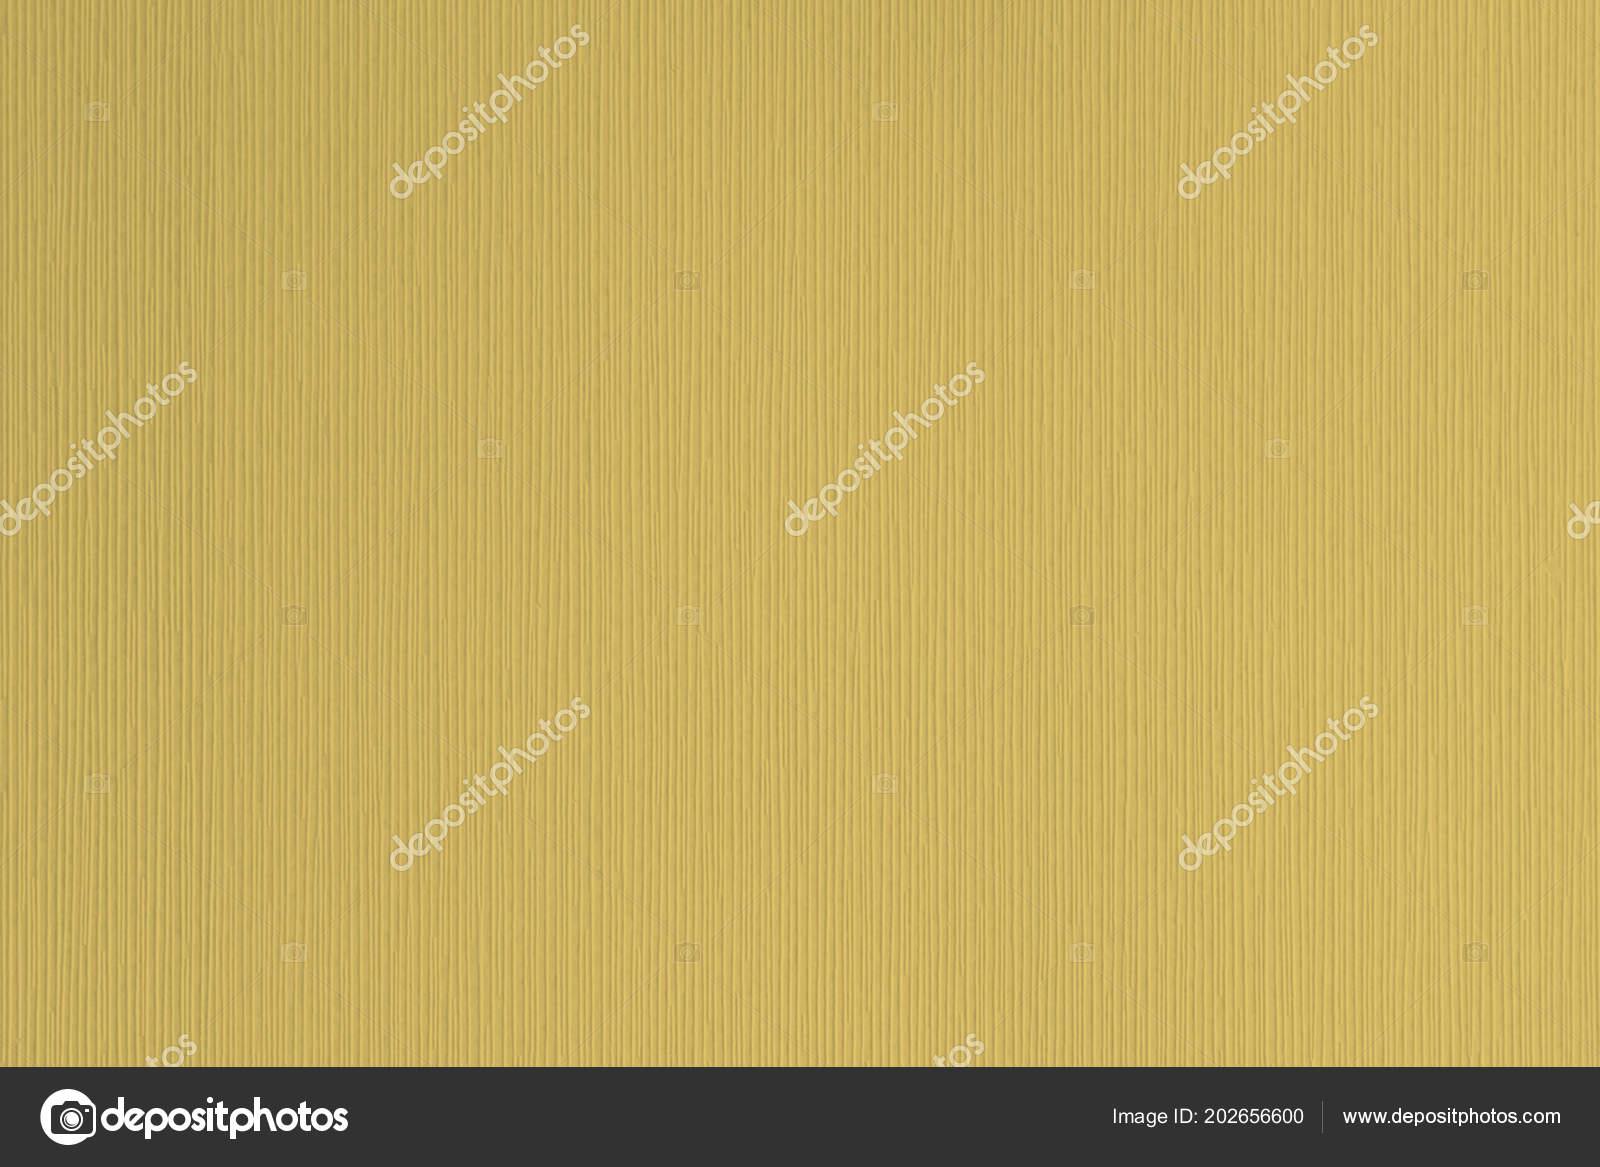 Mustard Yellow Textured Corrugated Striped Wallpaper Background